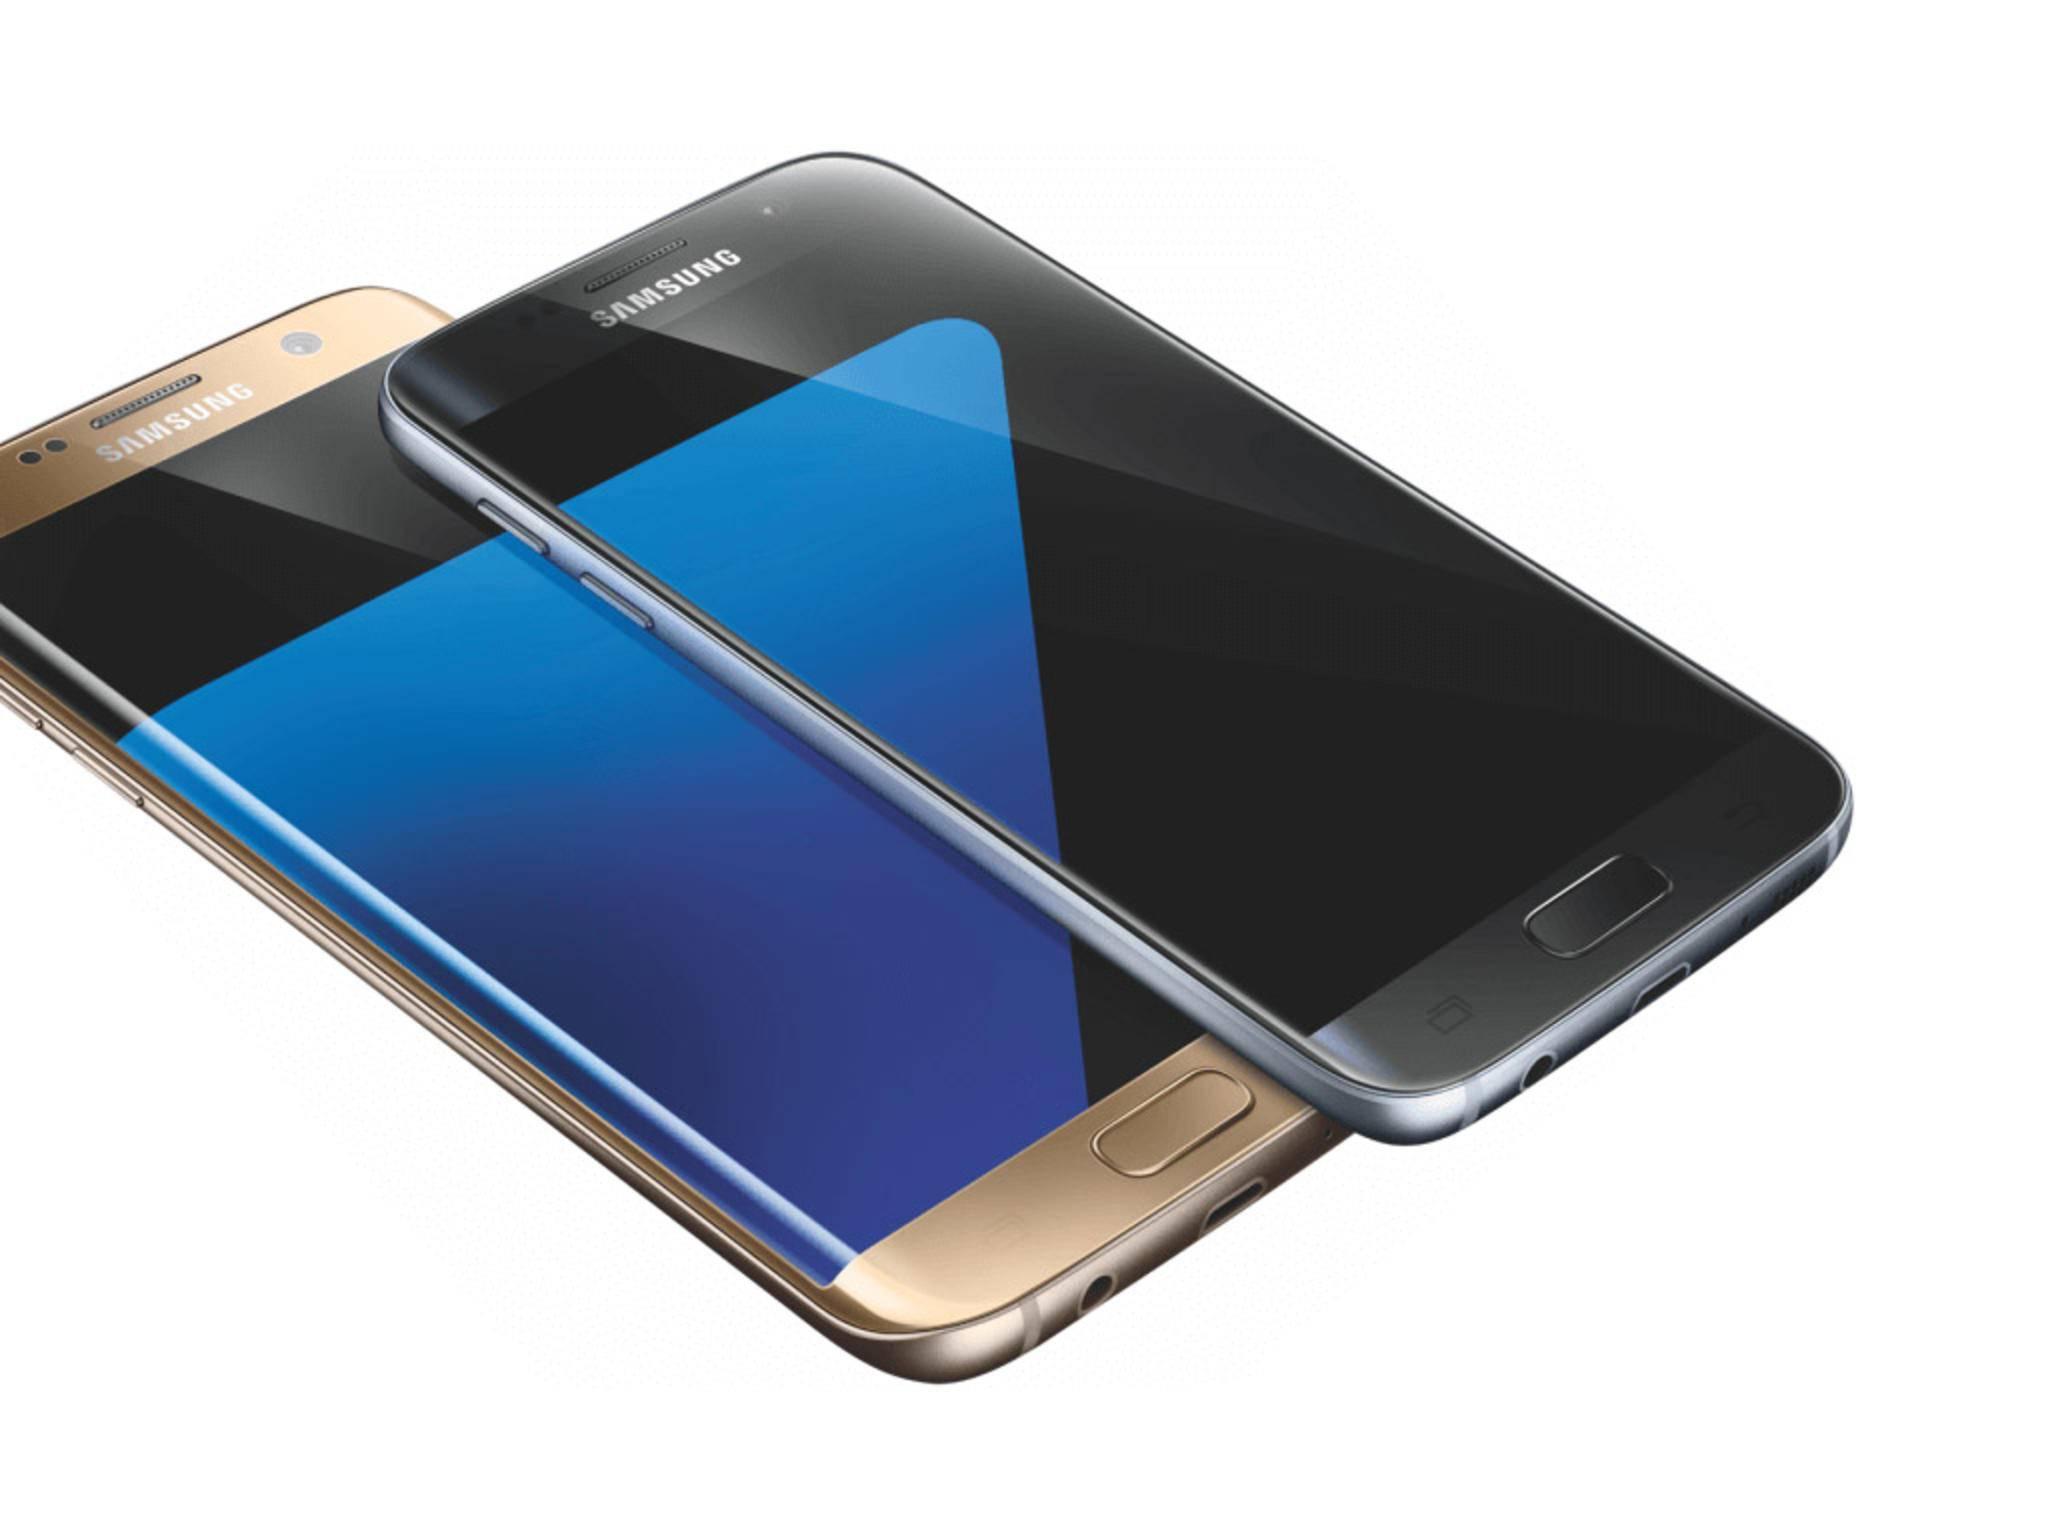 Galaxy-S7-Galaxy-S7-edge-Leak